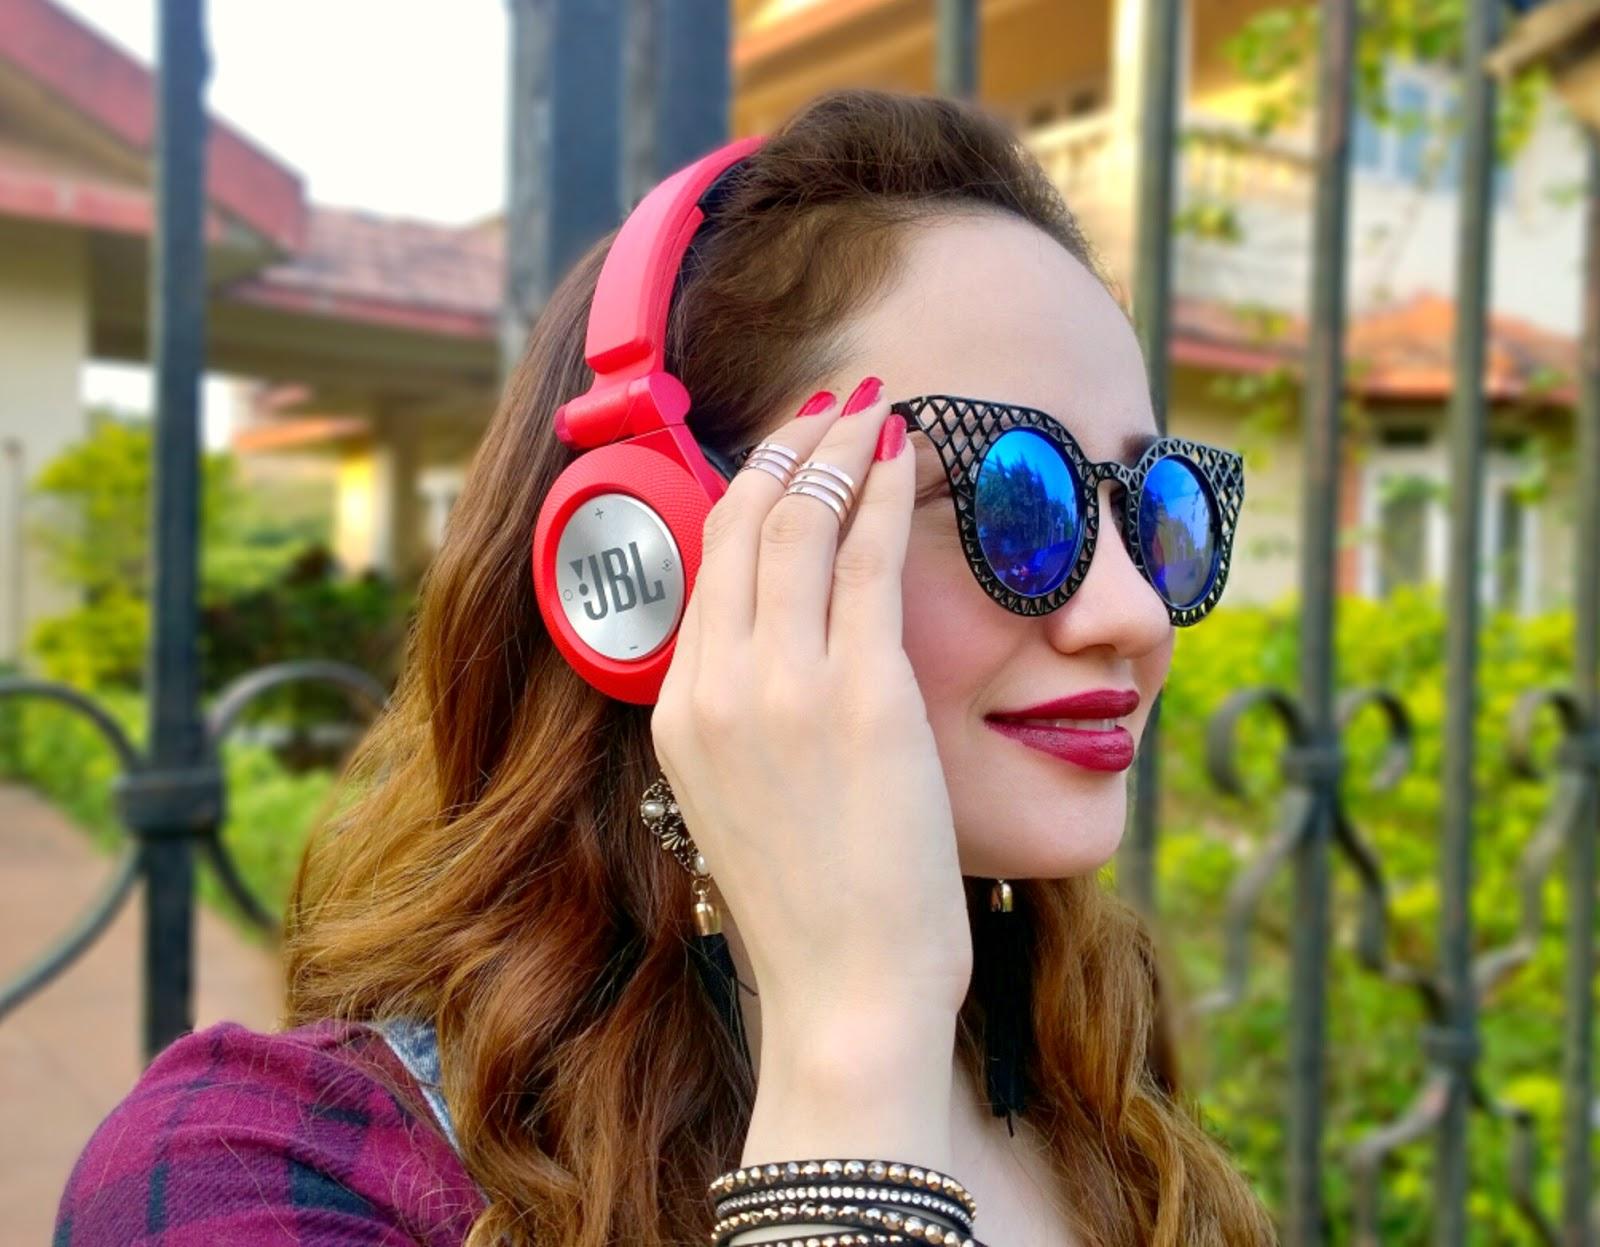 Candy Red JBL Wireless Headphones, Cat Eye Sunglasses, Midi-rings, MAC Diva Lipstick